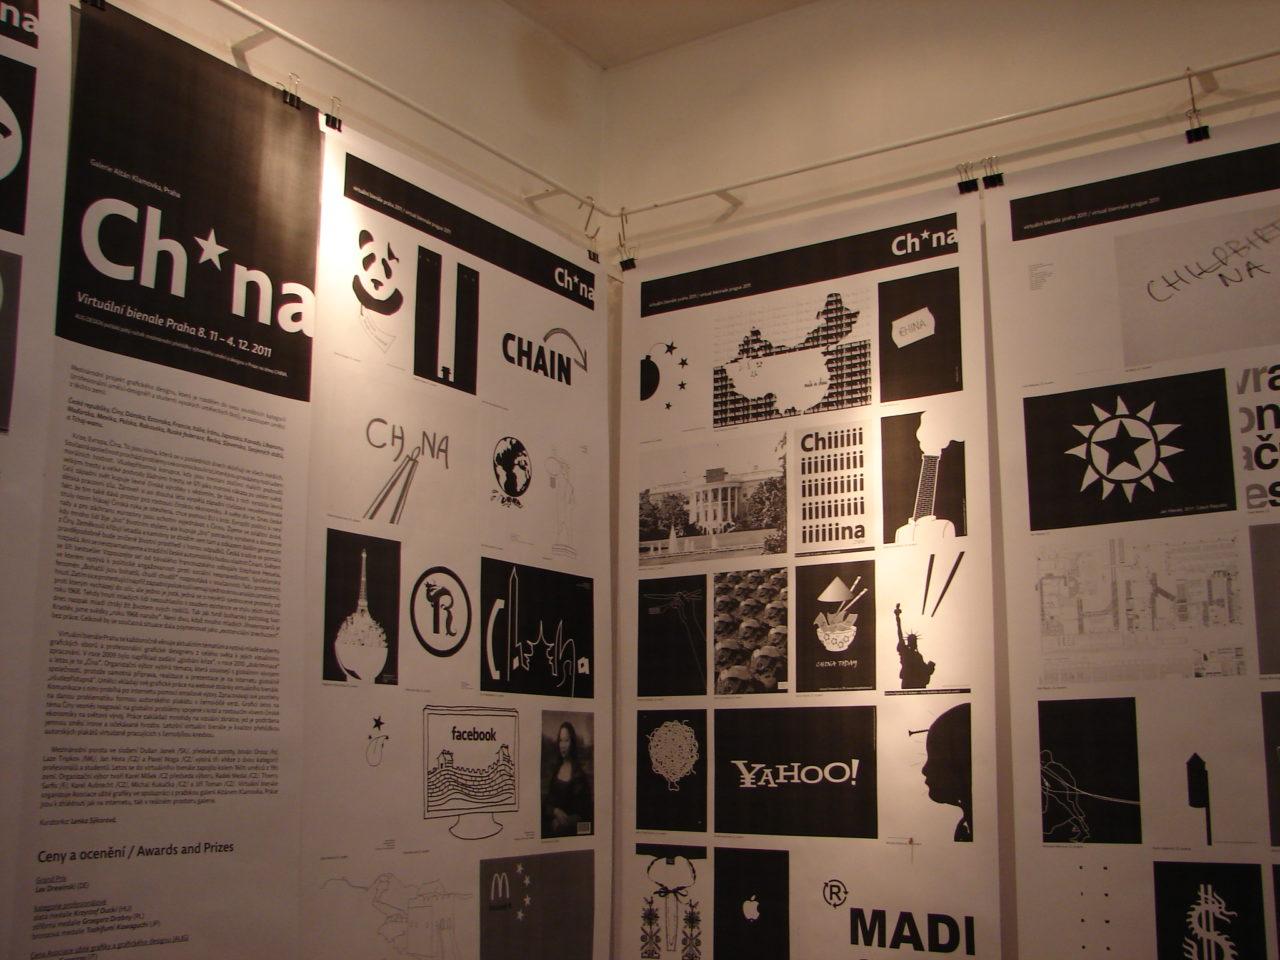 5. Virtuální bienále Praha 2011